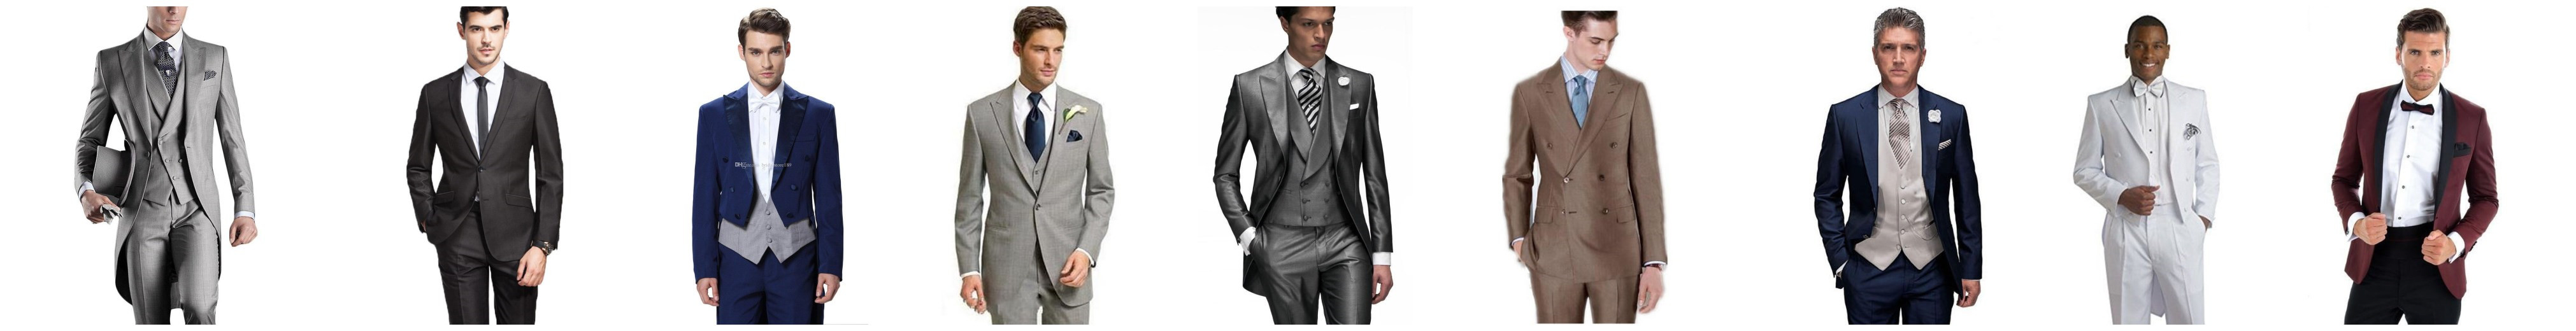 Fashion Man Woolen Suit Groom Best Man Wedding Dress Business ...